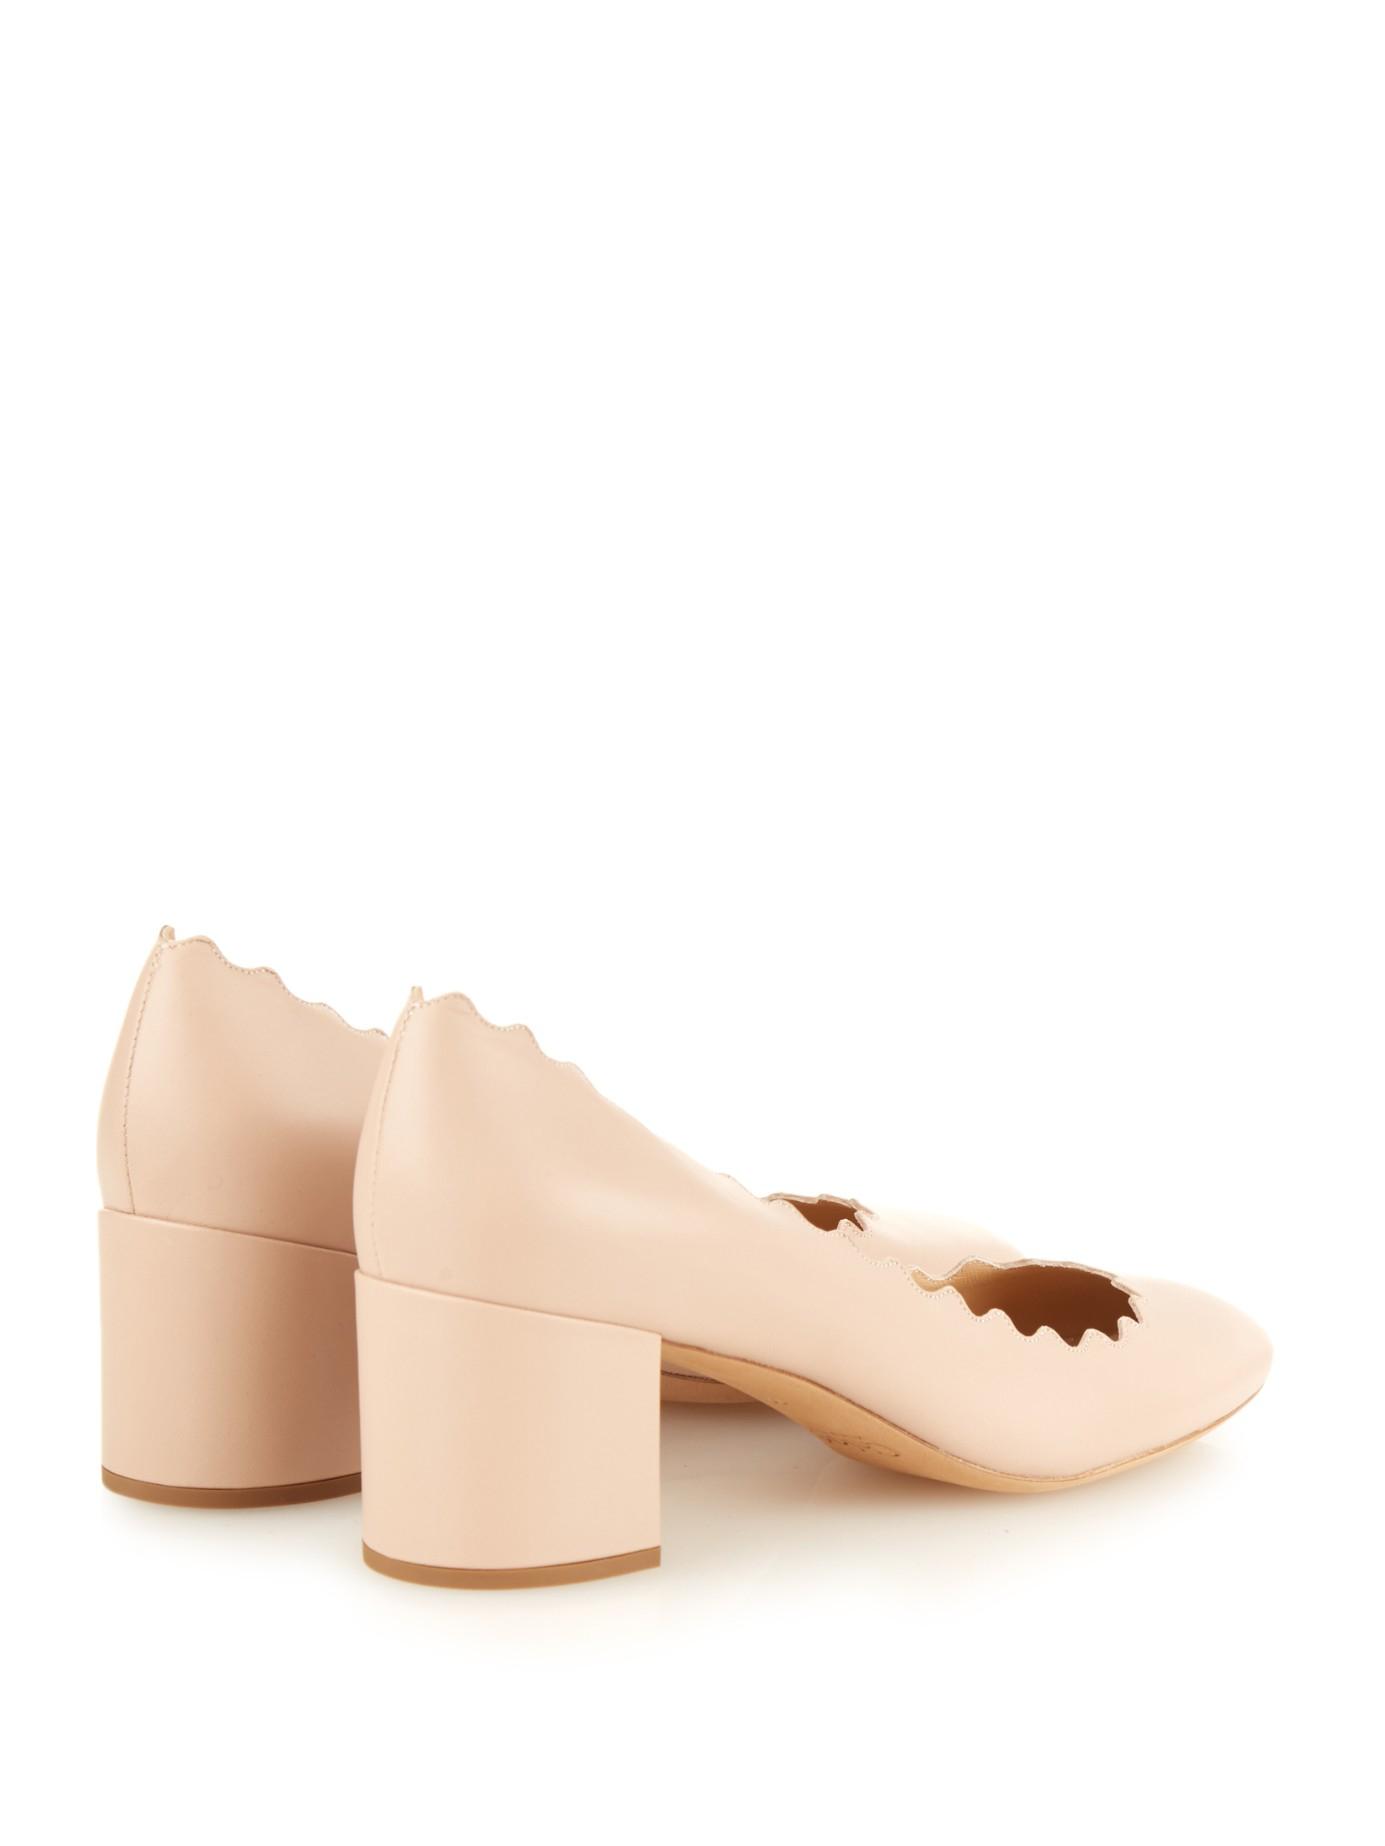 0a3c0262926 Lyst - Chloé Lauren Scalloped-edge Block-heel Leather Pumps in Pink